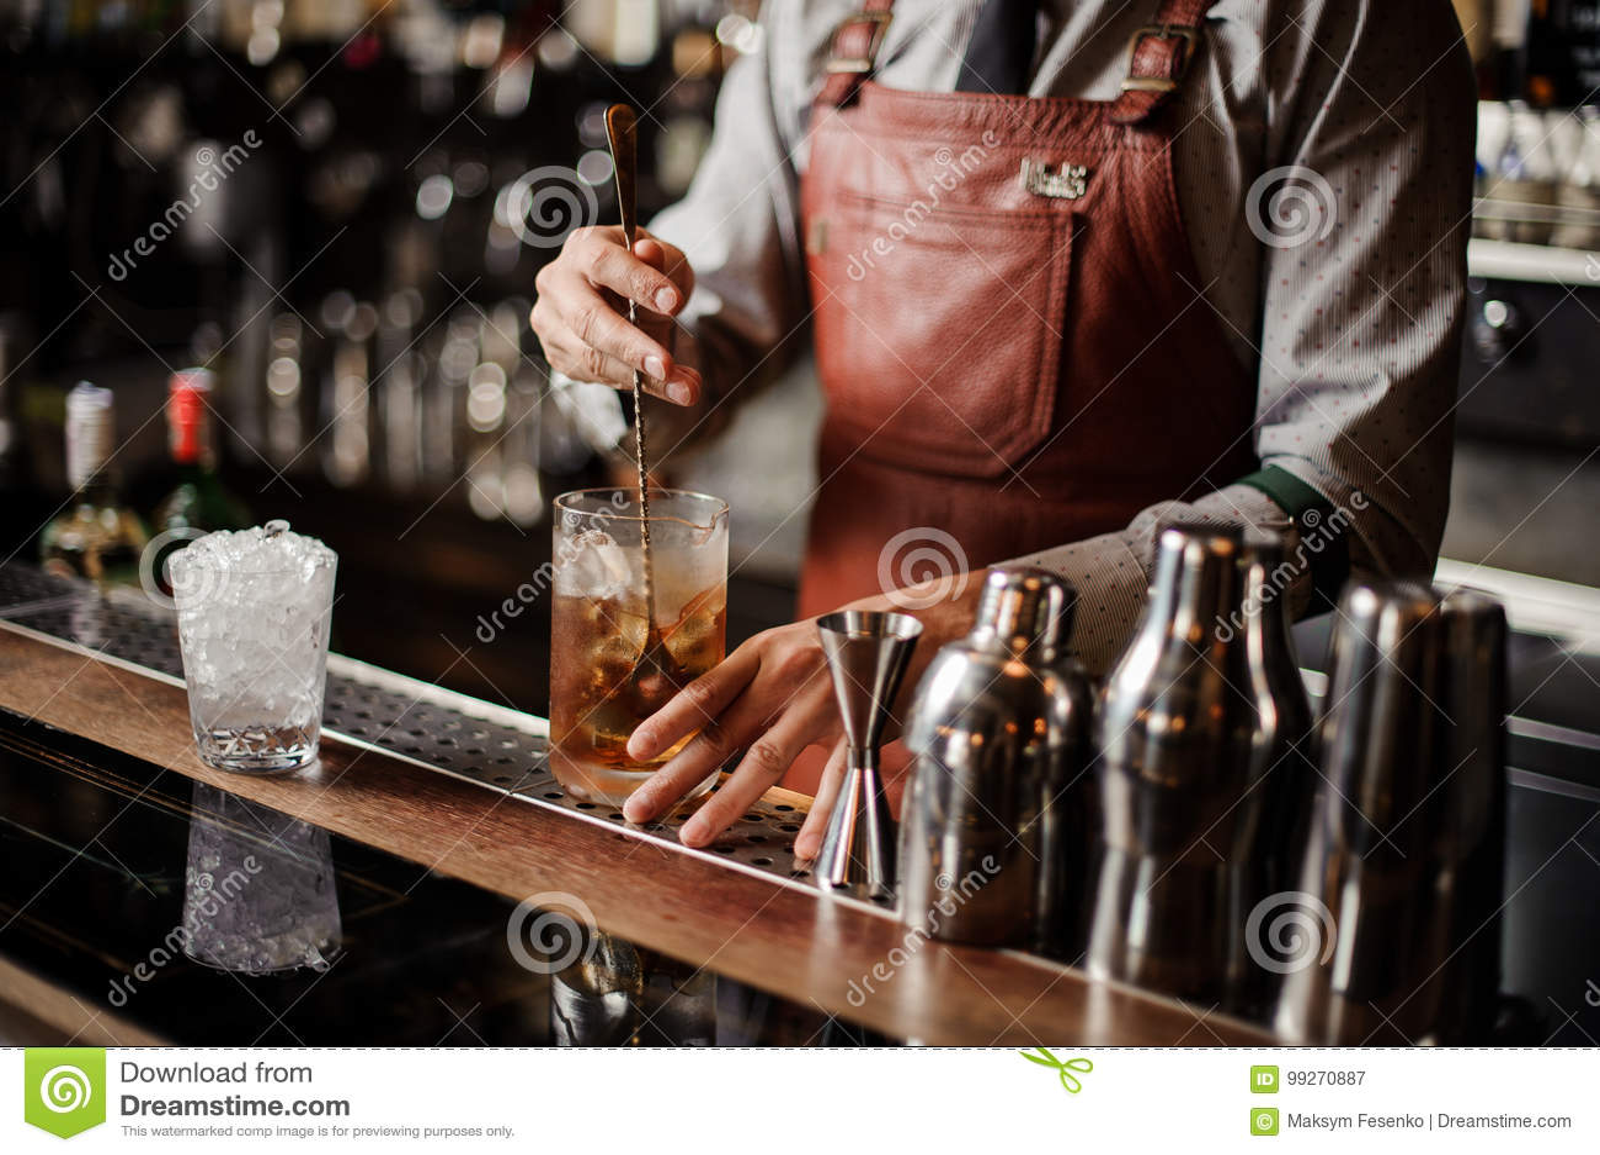 Barman die uit Cocktailglas koelen die ijs mengen met een lepel